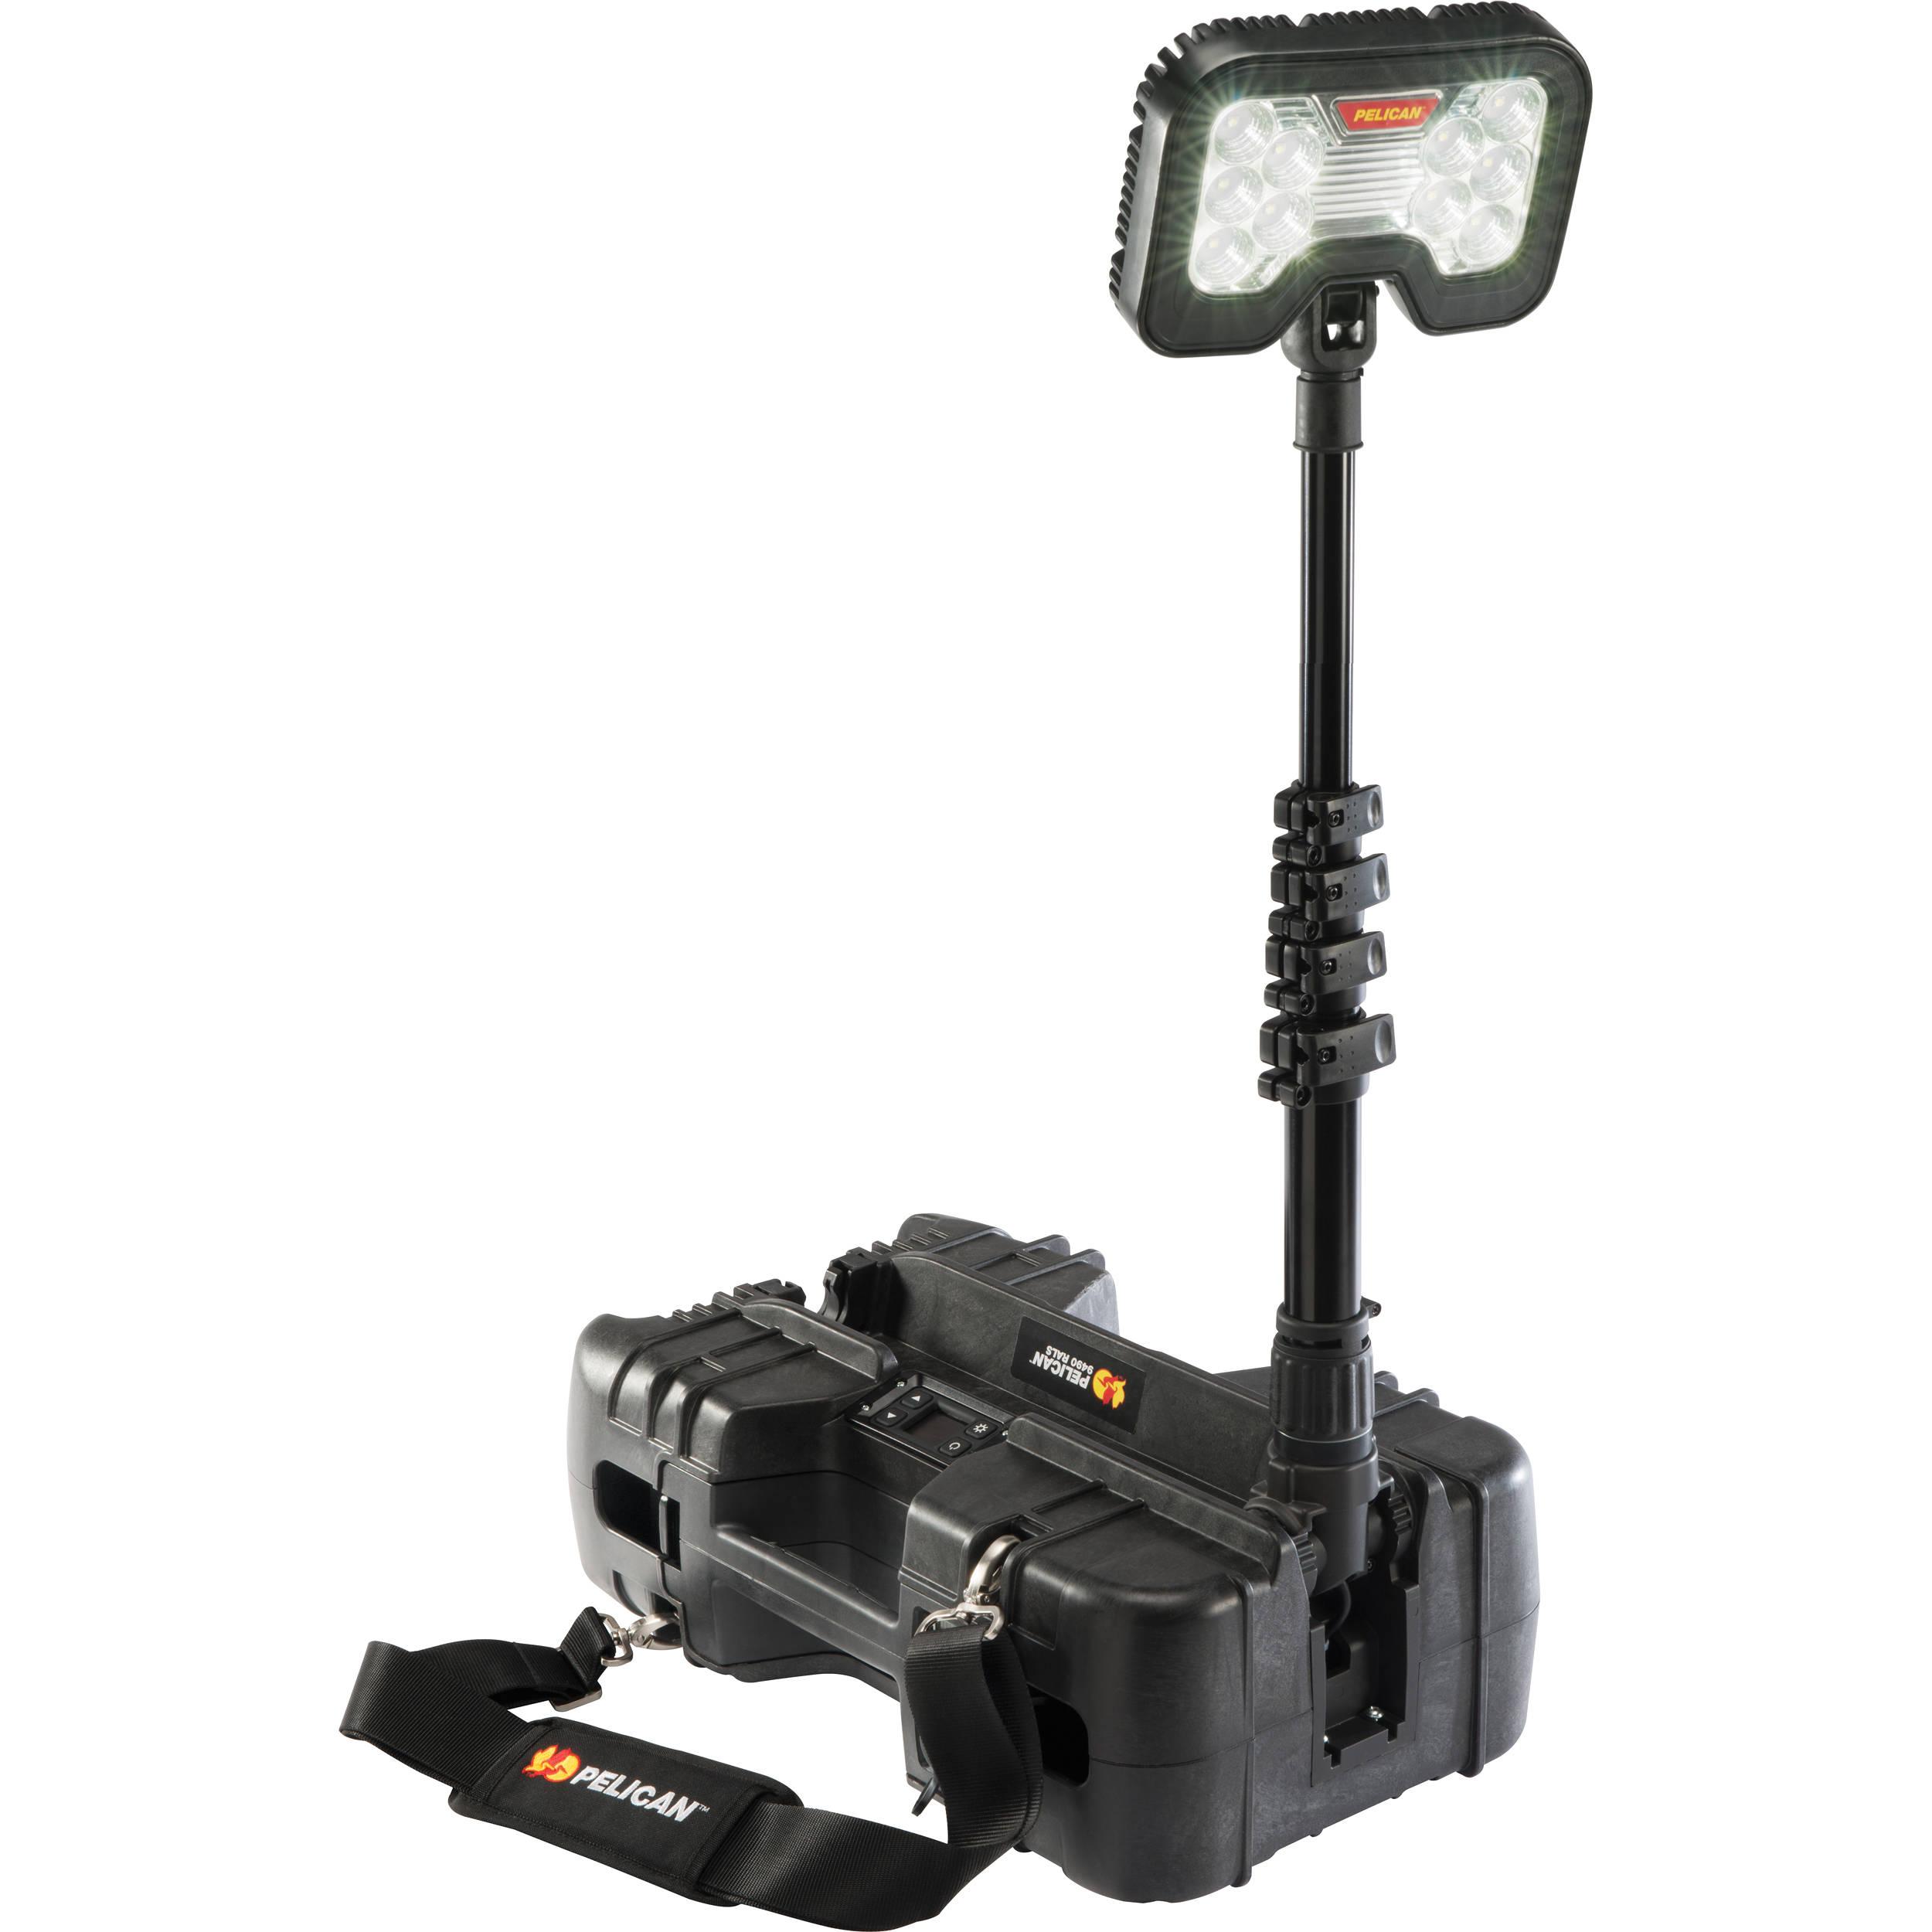 Pelican 9490 Remote Area Lighting System Black 094900